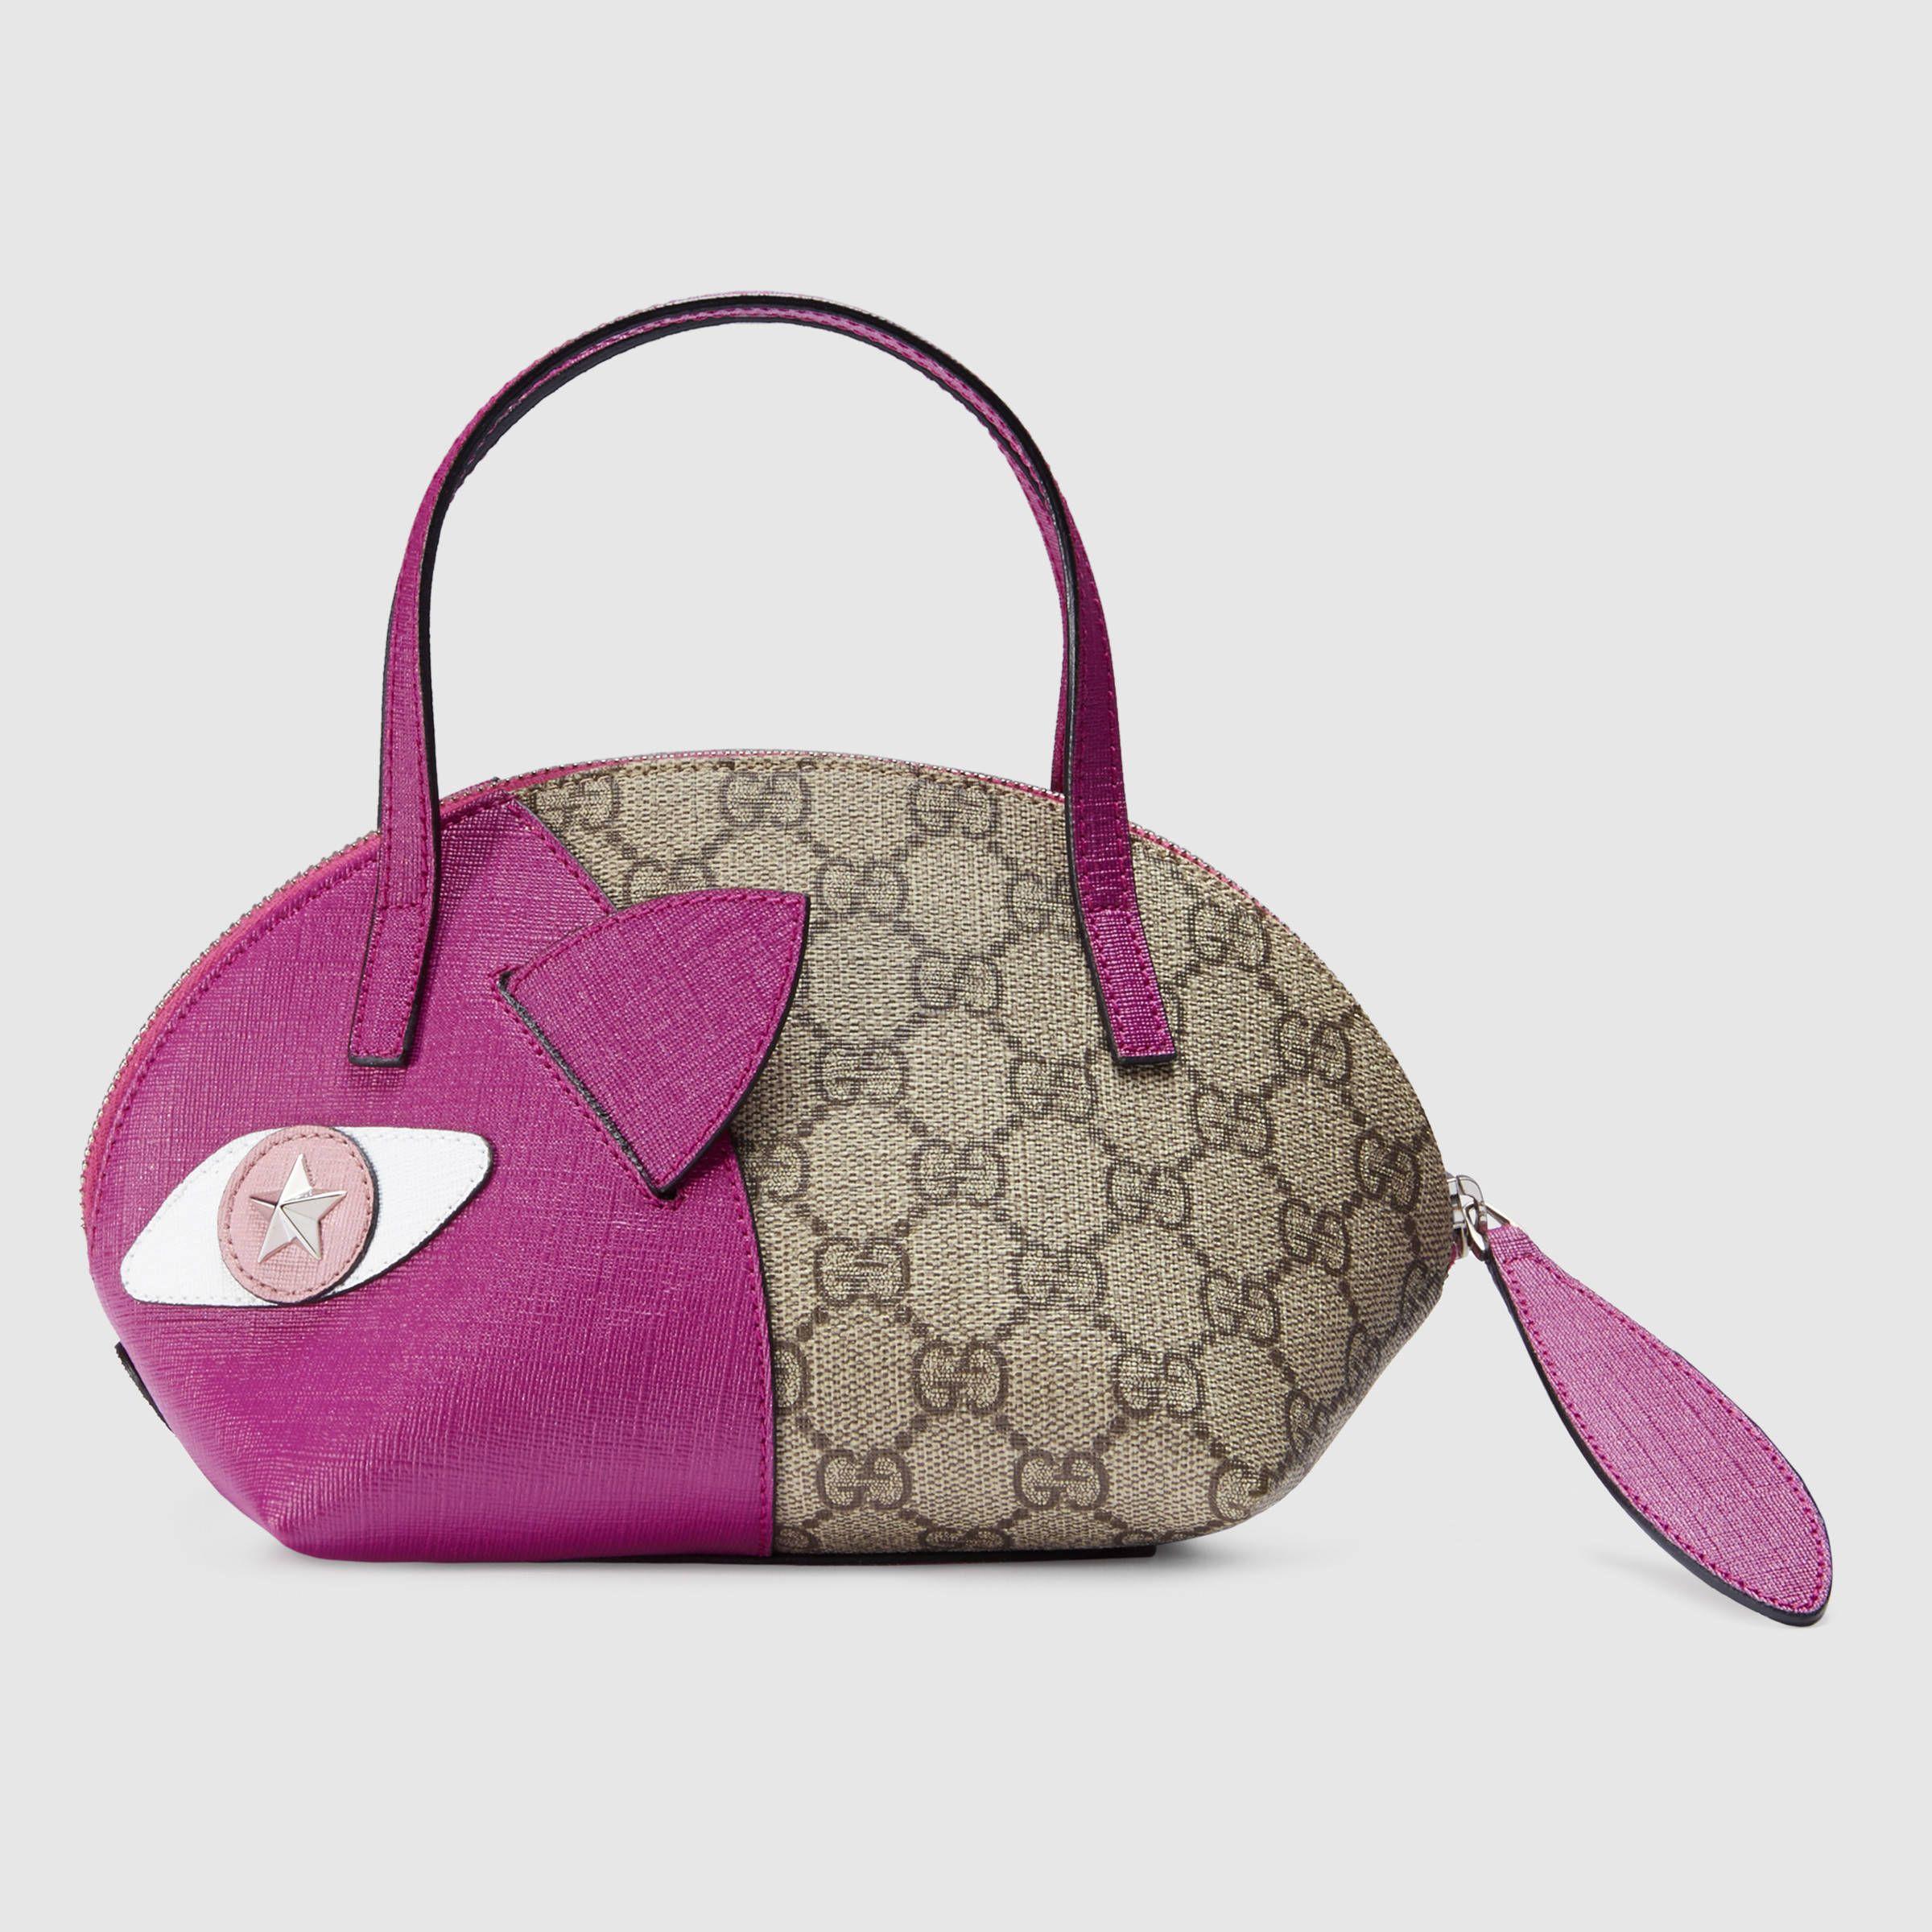 d6cb43a7 Gucci Children - Children's GG Supreme cat top handle ...